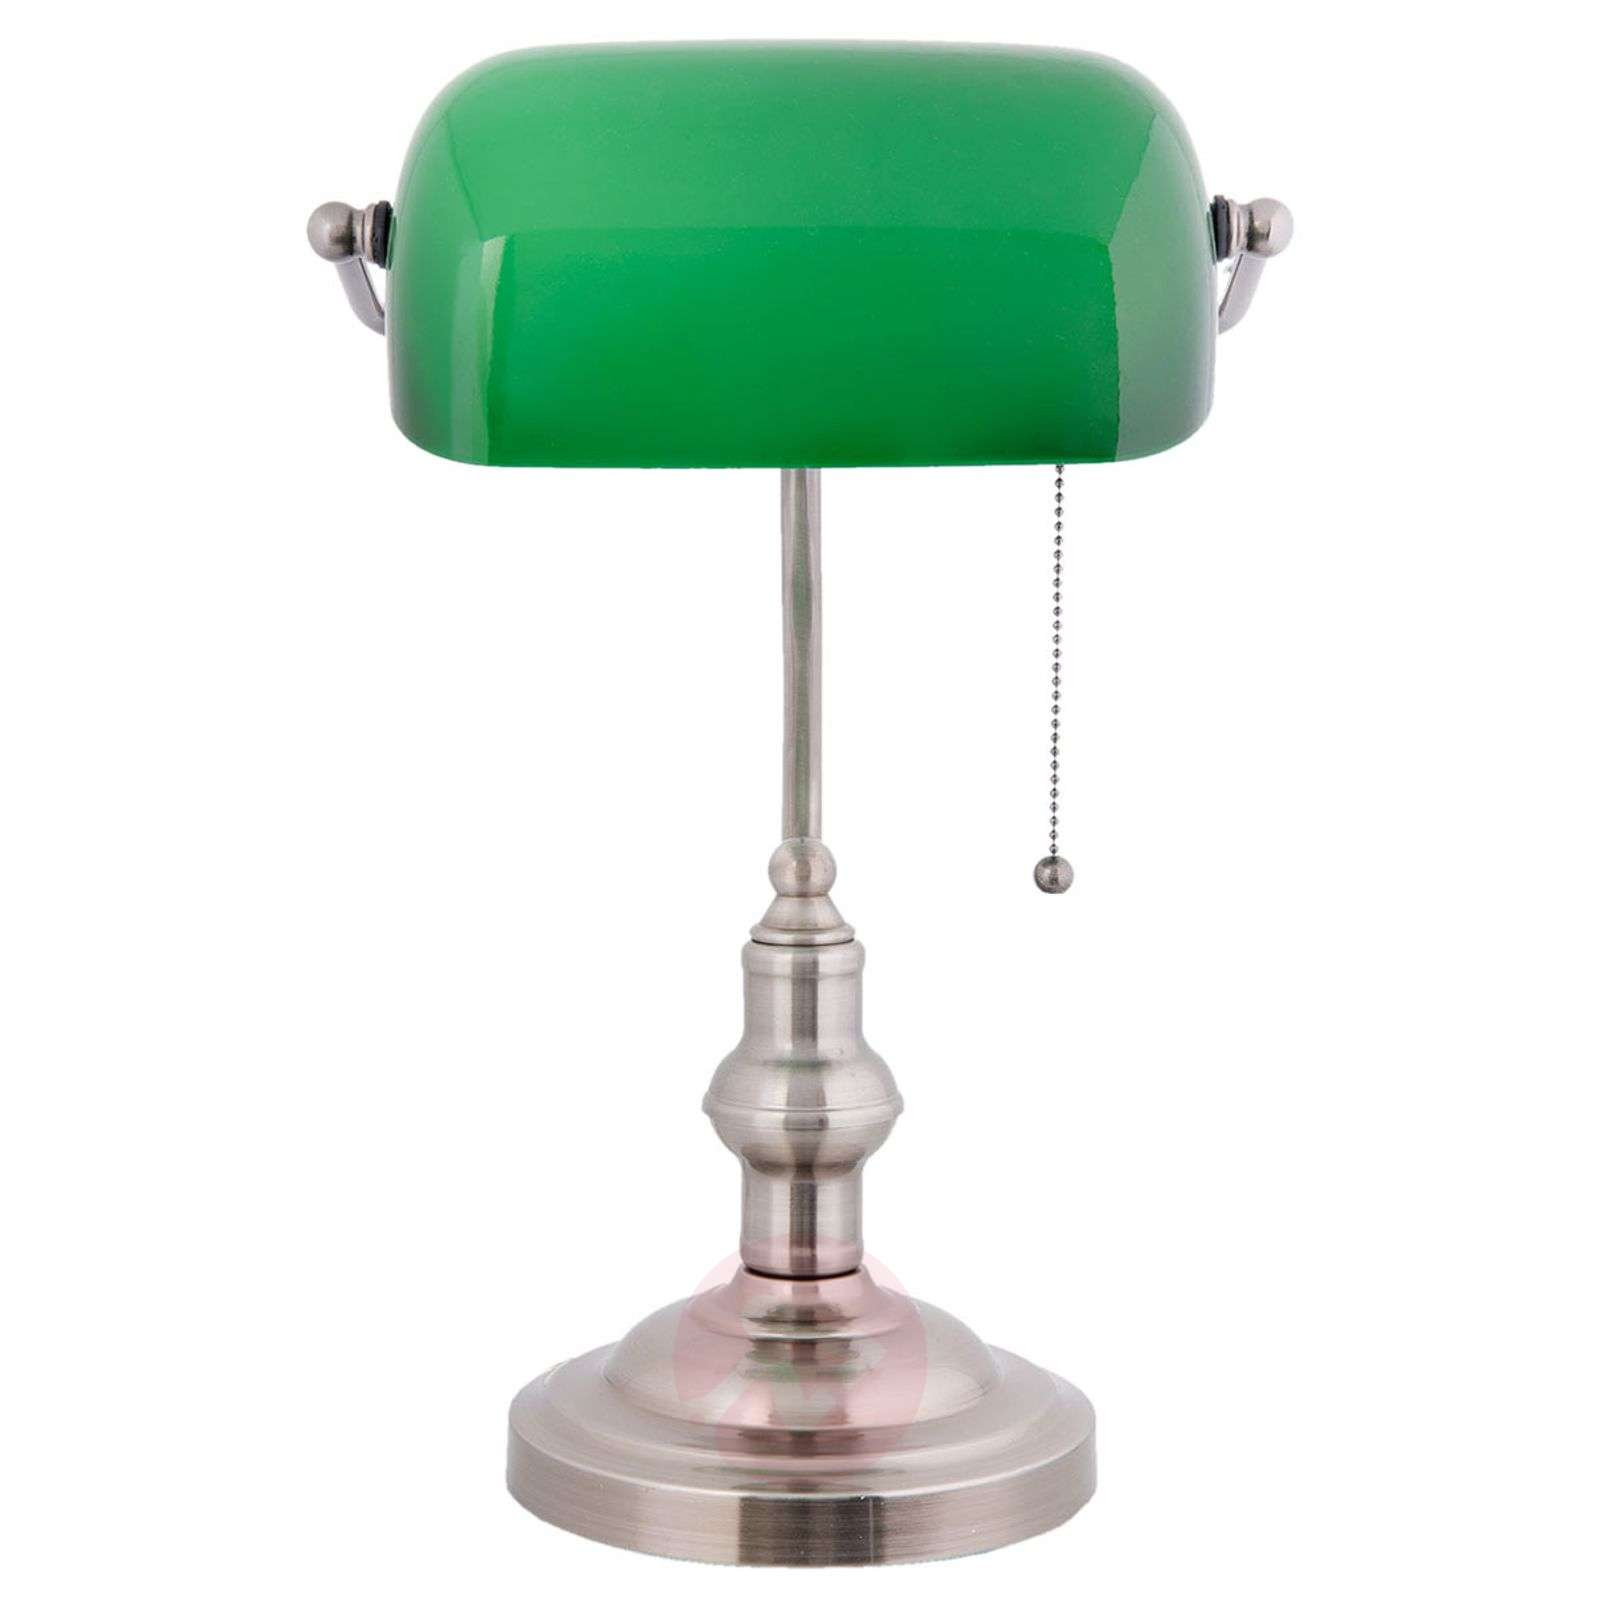 Decorative banker lamp Verda with a nickel base-6064122-01